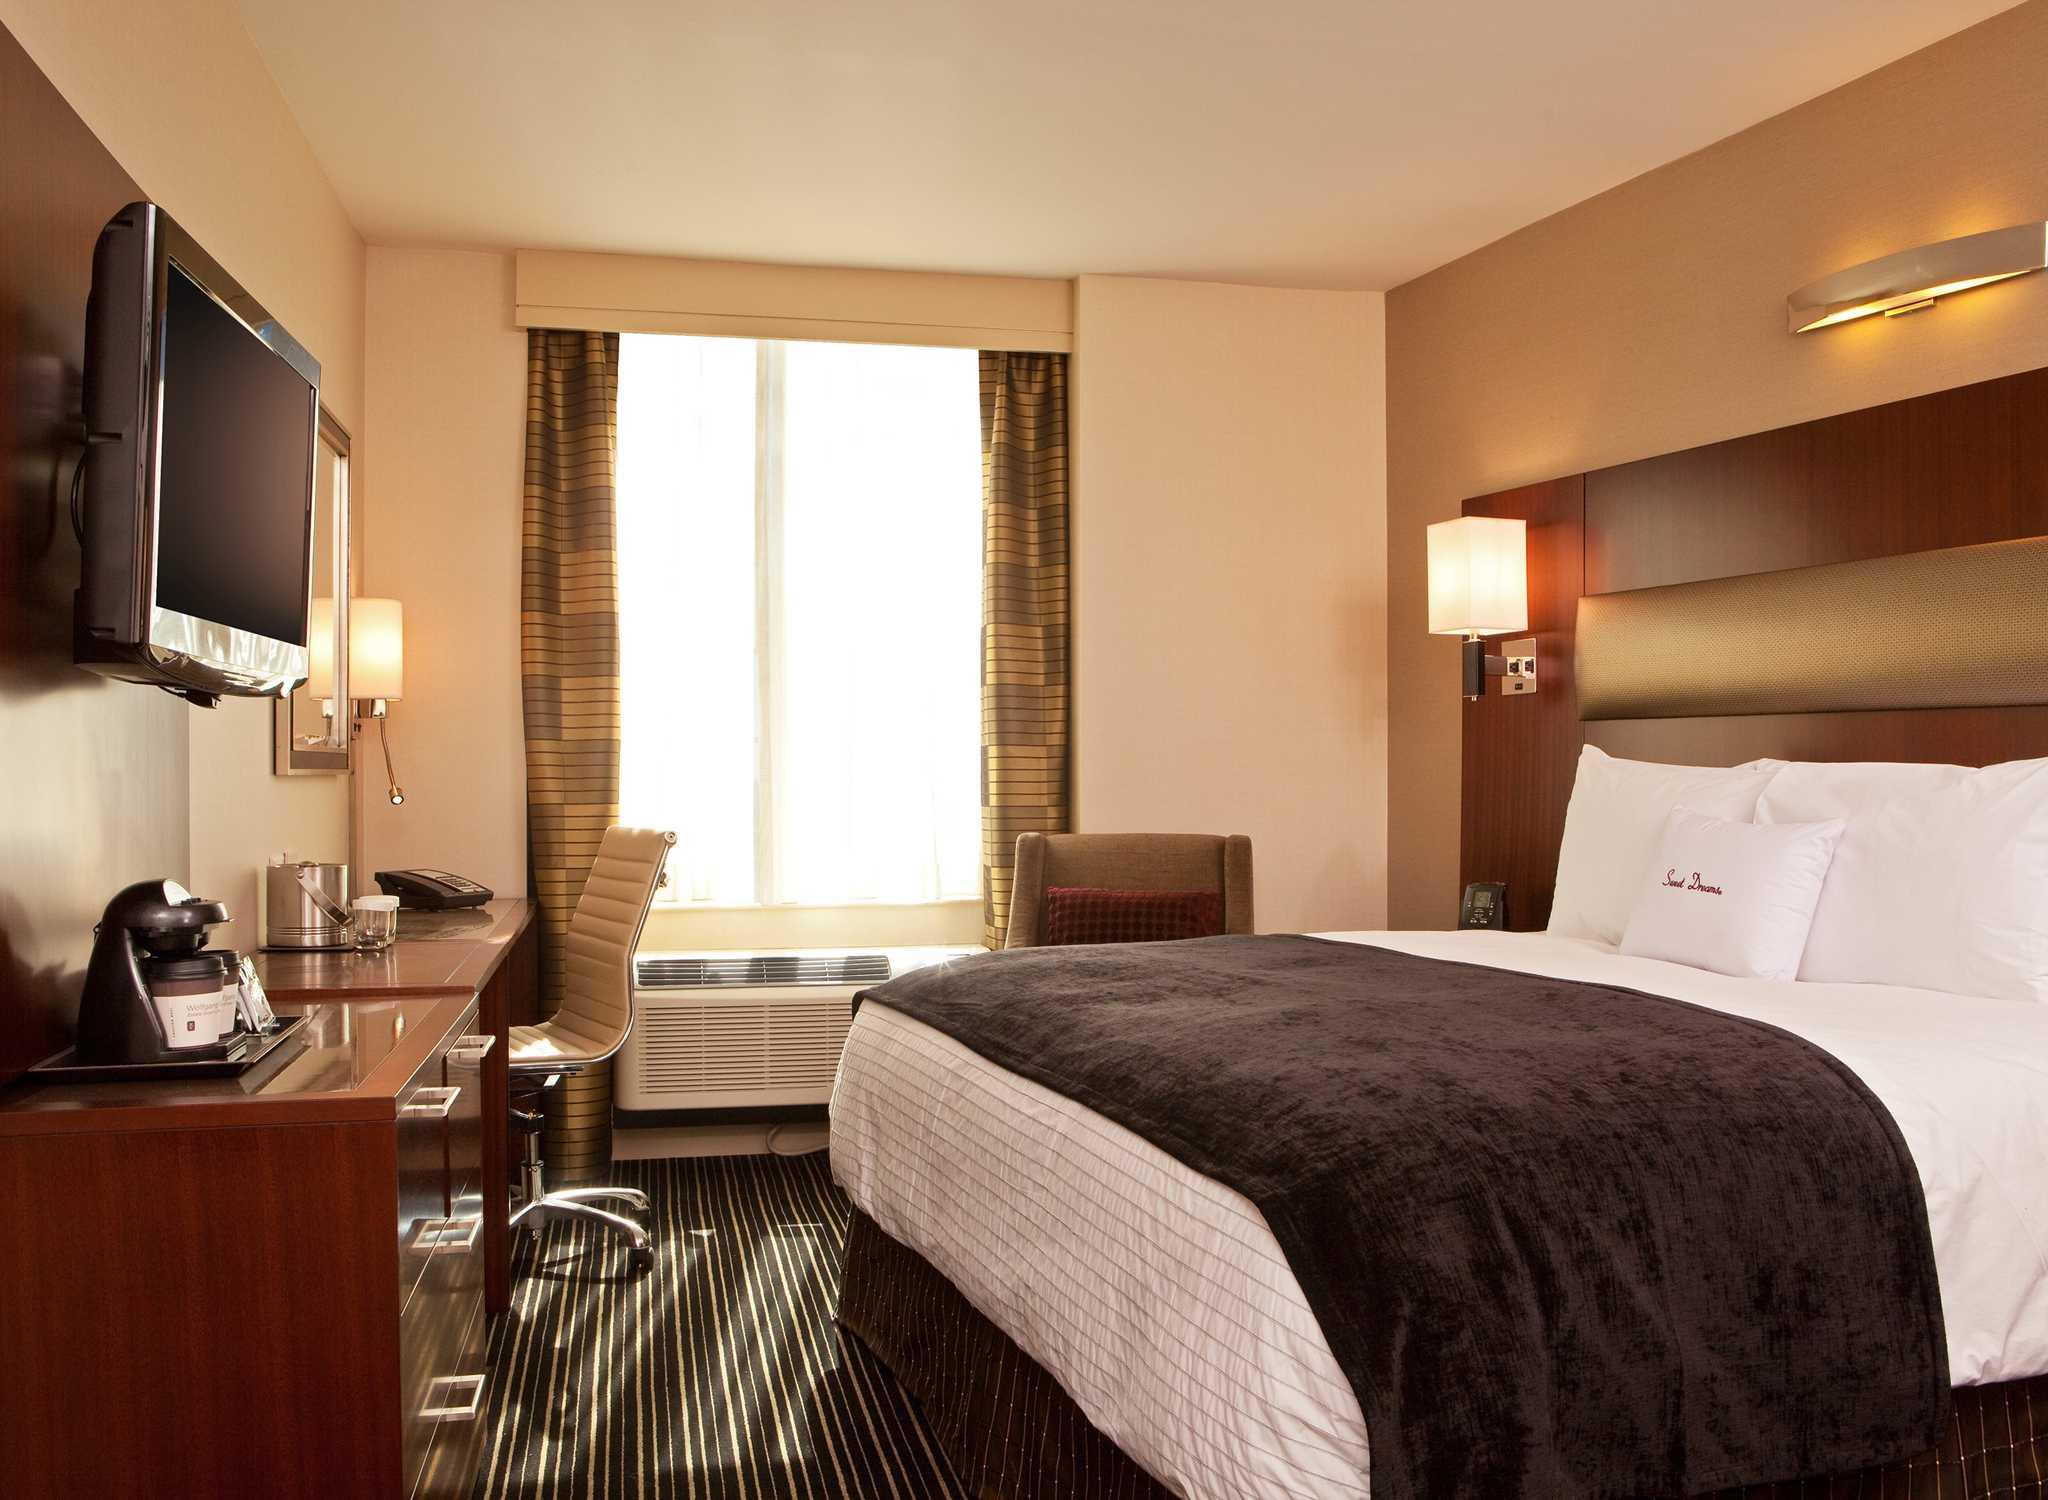 Doubletree By Hilton Hotel New York City Financial District Tripadvisor